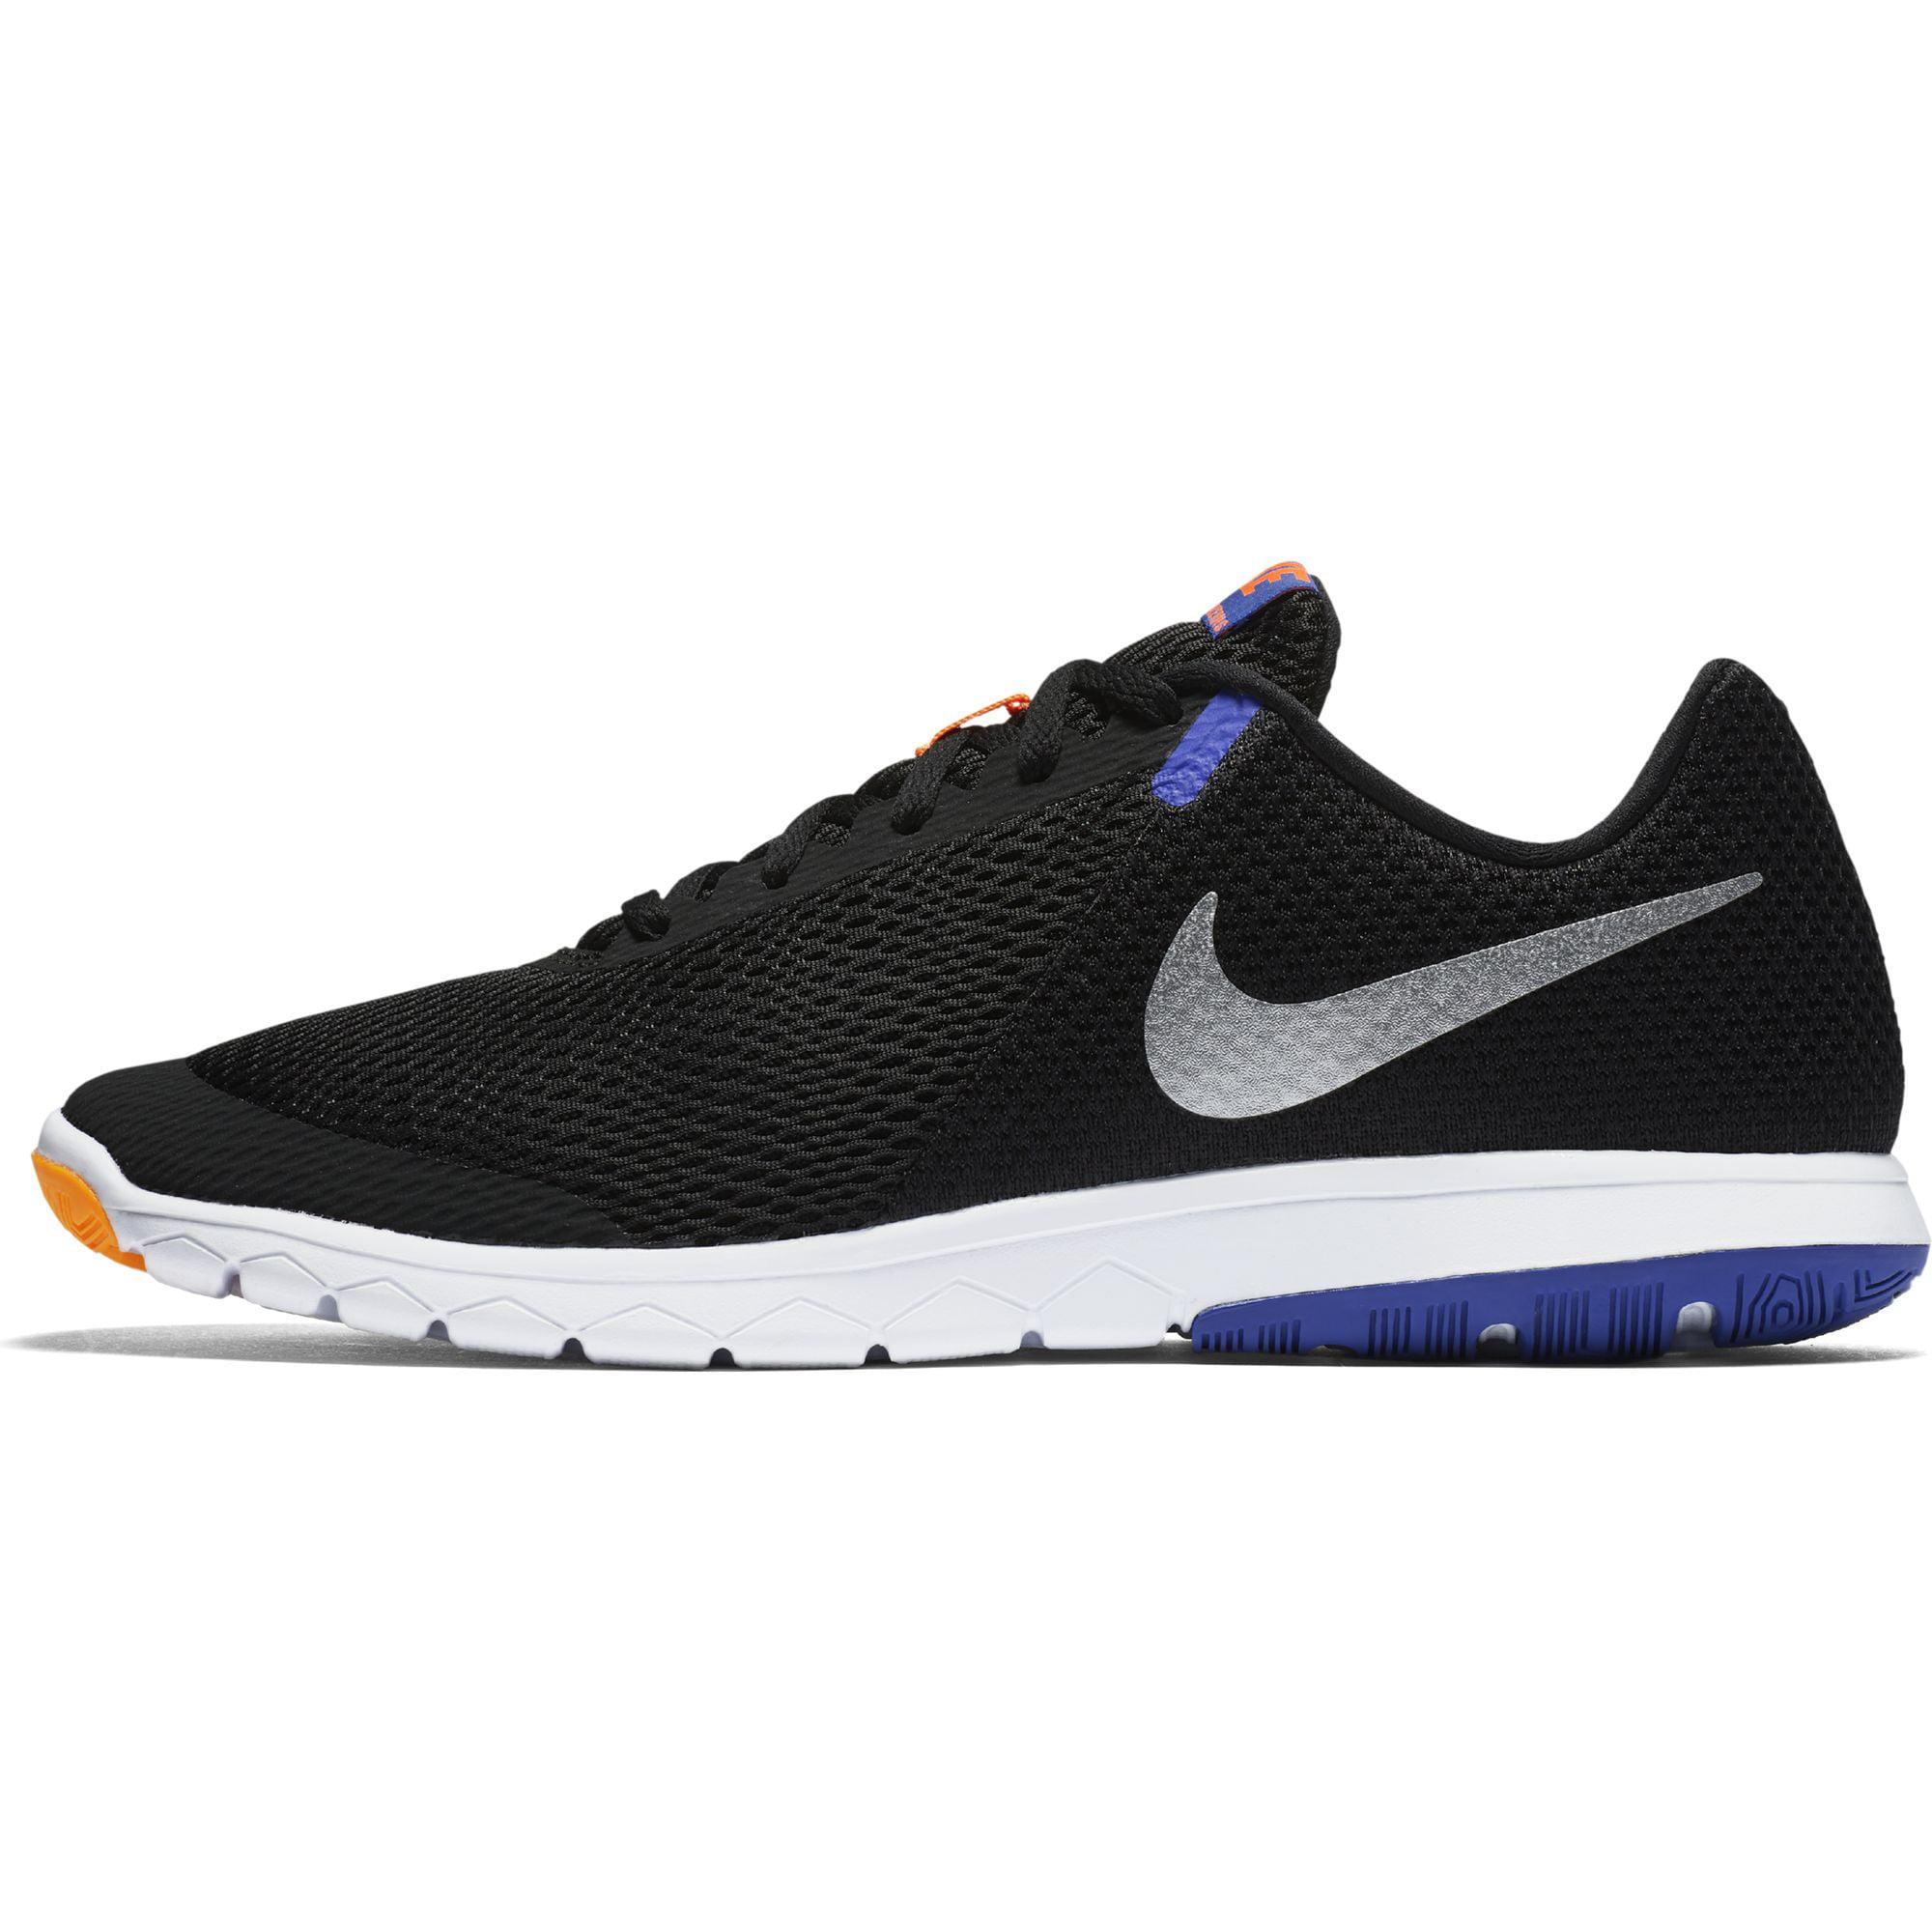 Nike Flex Experience RN 6 Men's Running Shoes, Black/Chrome-Persian Violet-Total Orange 8